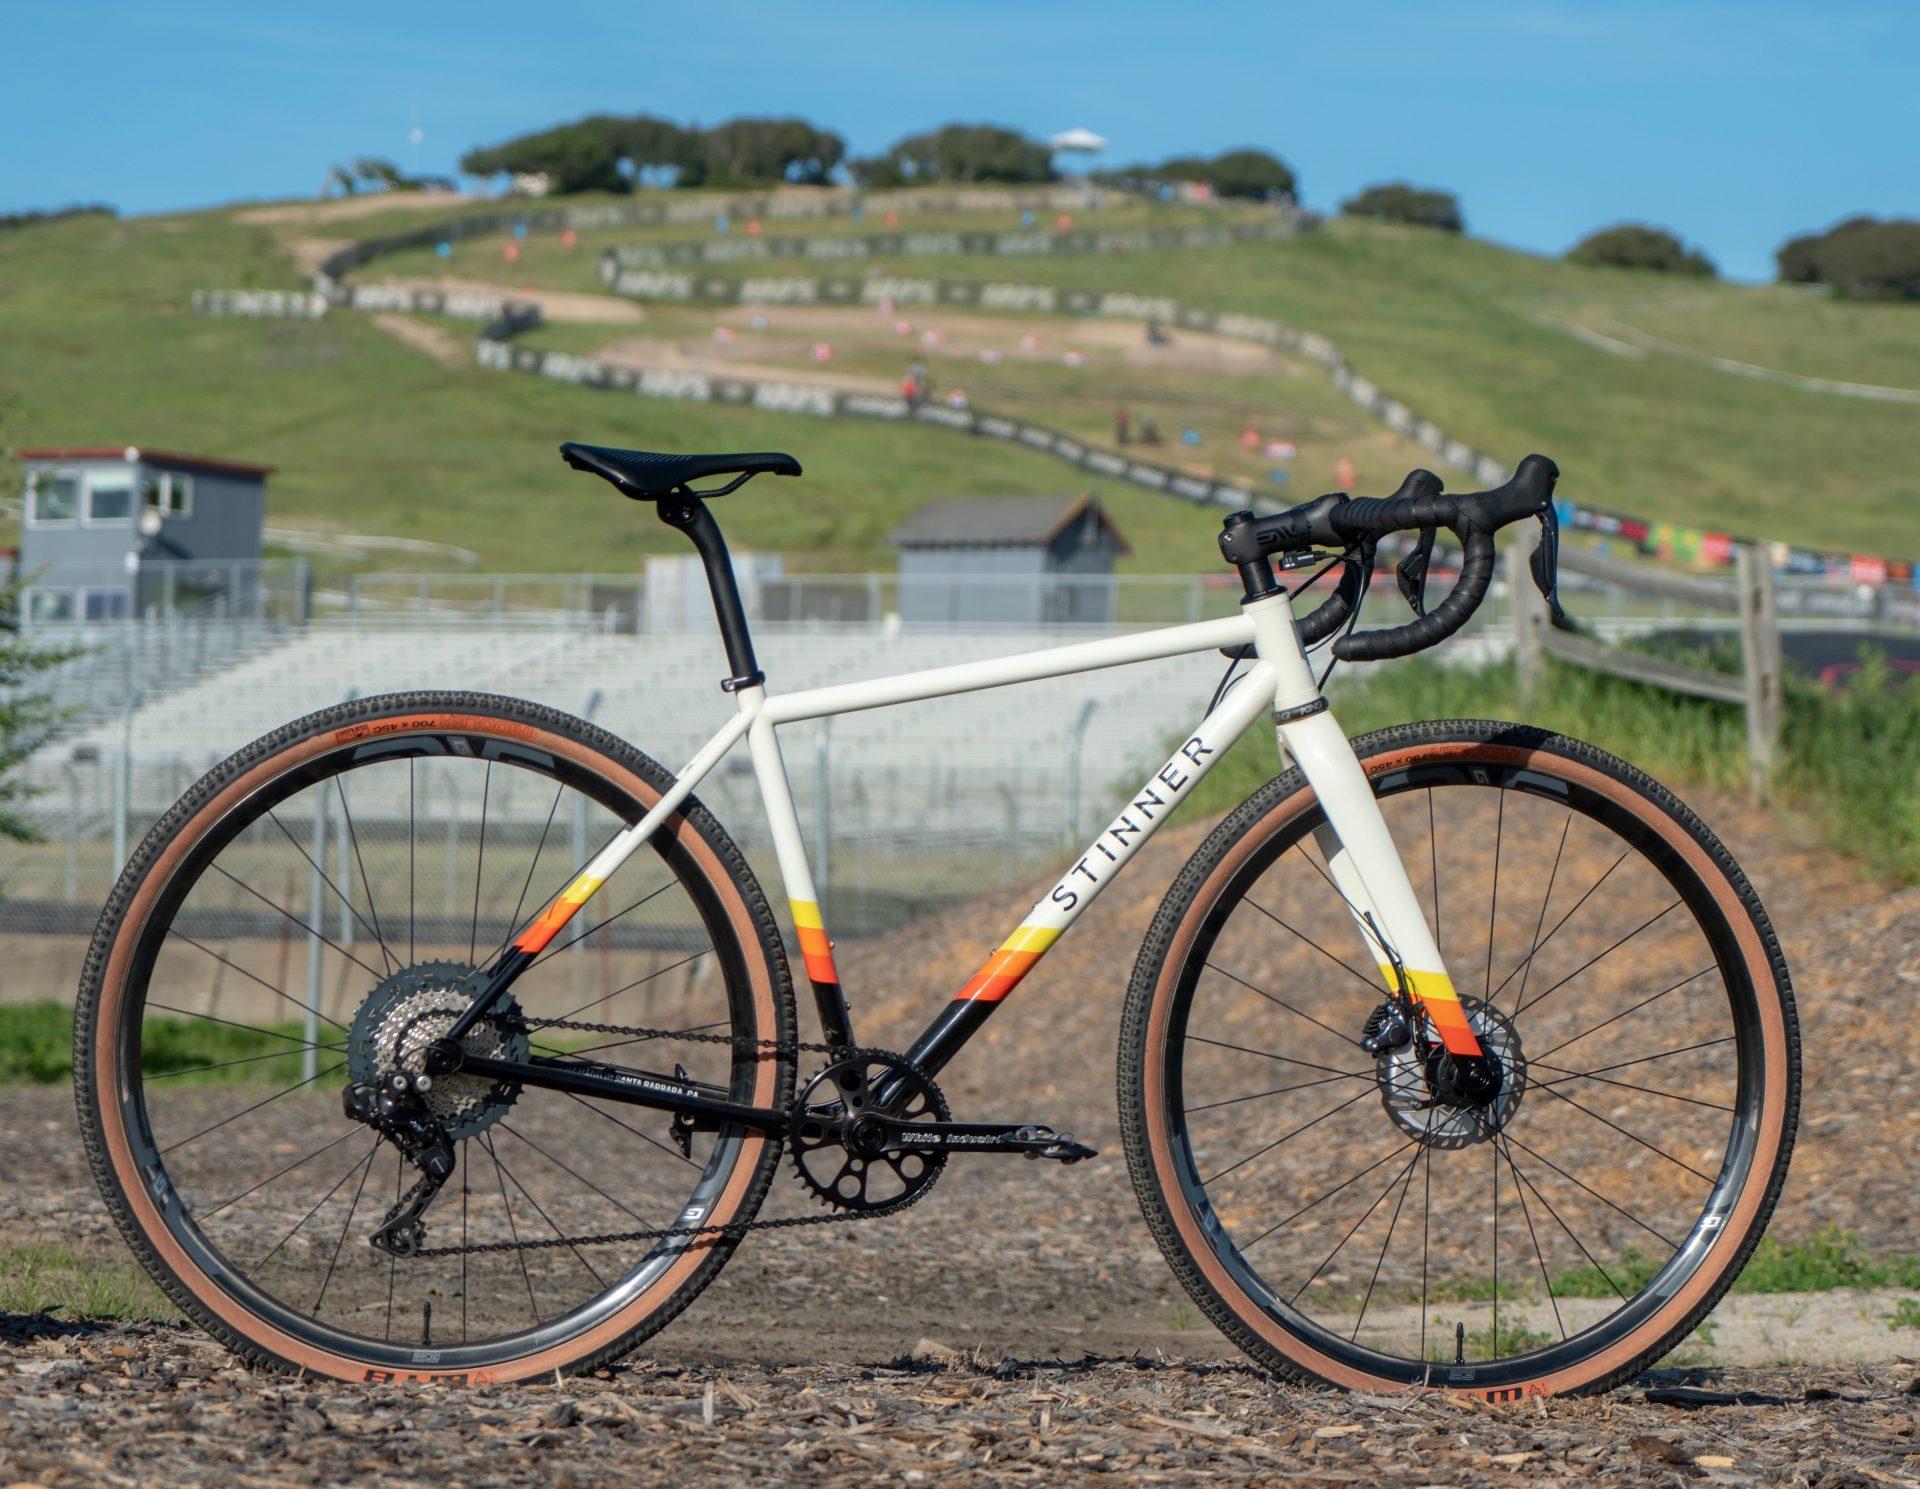 Builders For Builders: Dream Bike Raffle Benefiting Sierra Trails 4